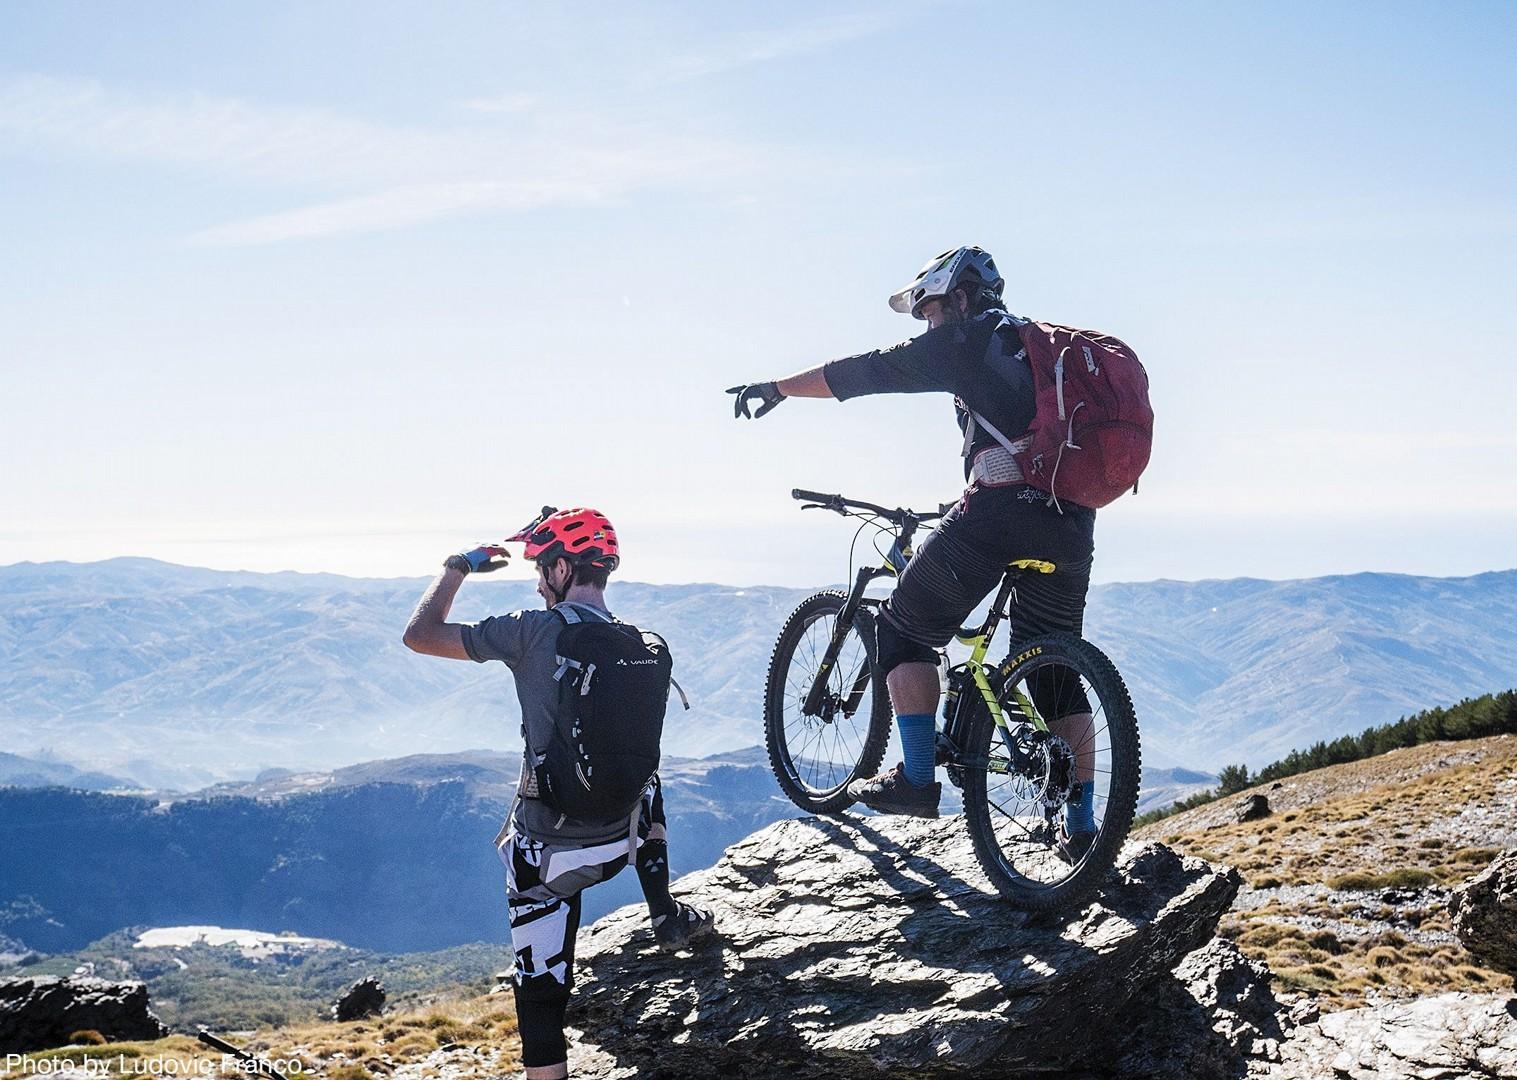 mountain-biking-holiday-in-spain-sierra-nevada-skedaddle.jpg - Spain - Sensational Sierra Nevada - Mountain Biking